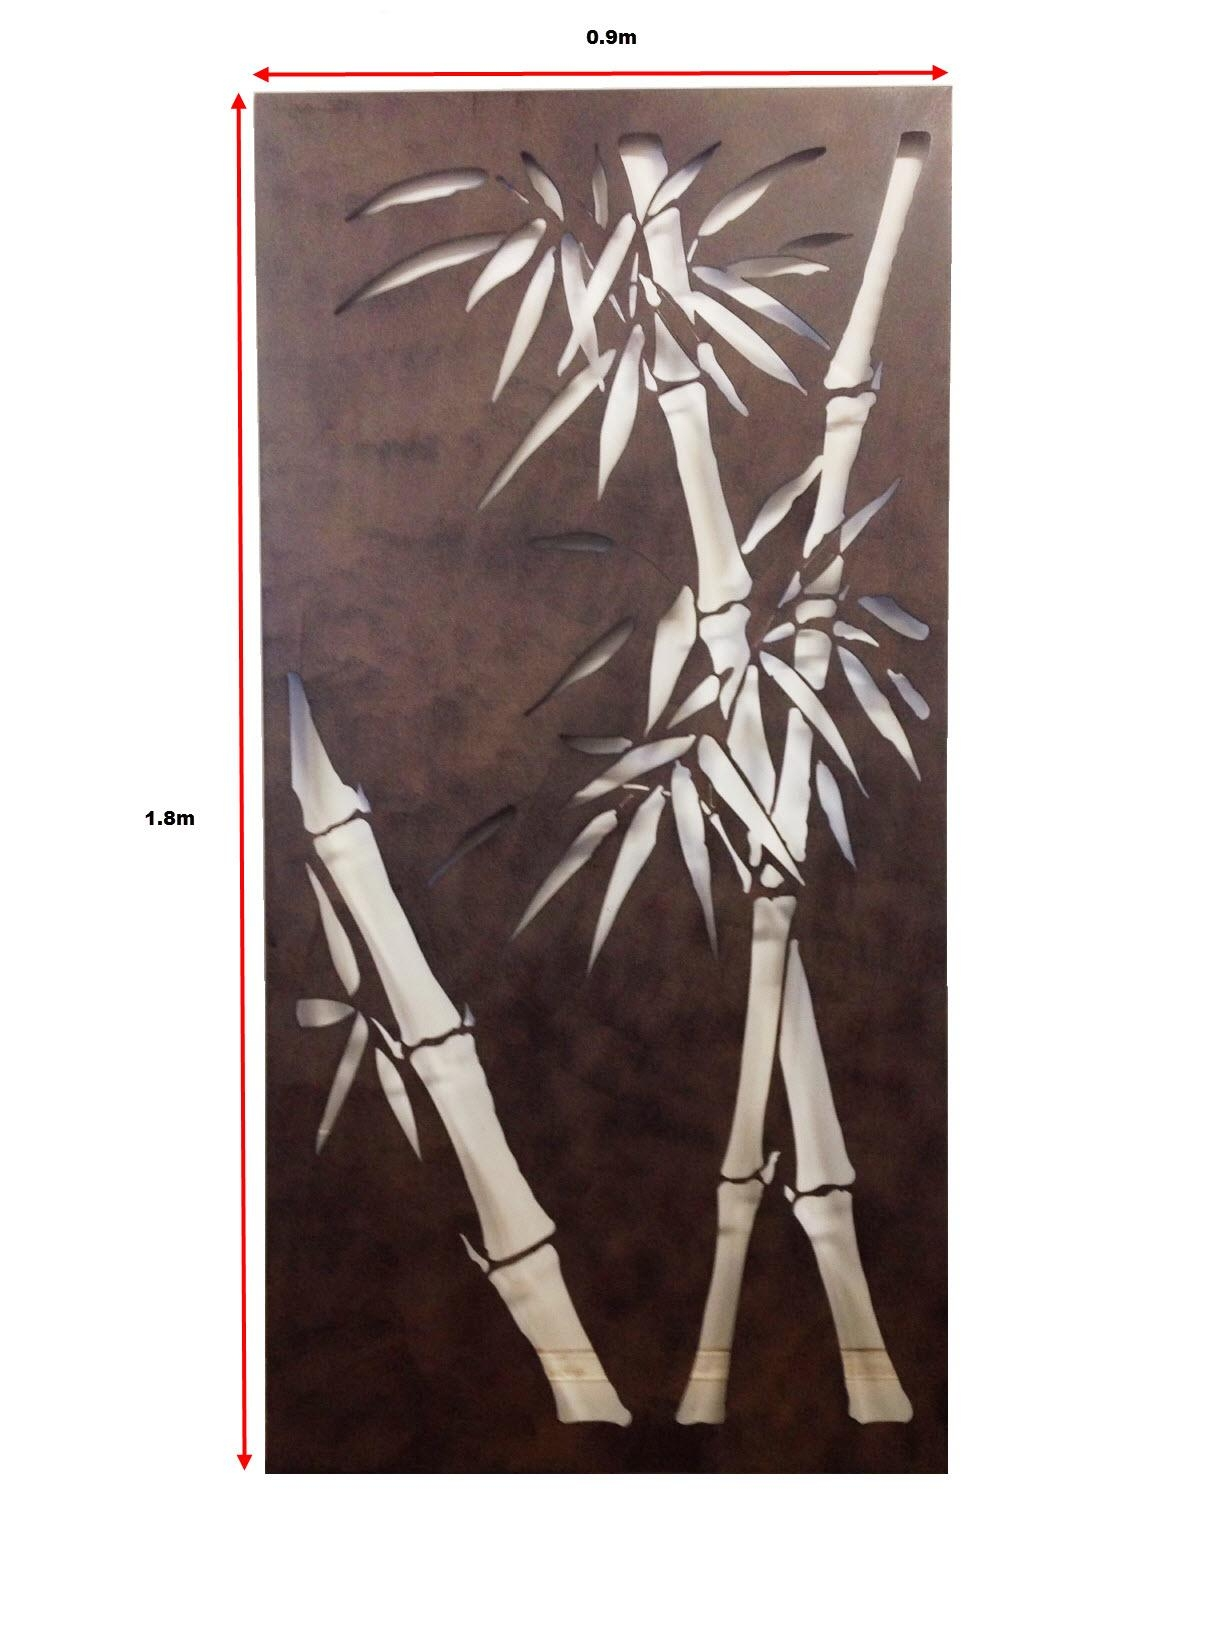 Garden Screens Ebay Decorative Metal Wall Art Bamboo ~ Loversiq for Bamboo Metal Wall Art